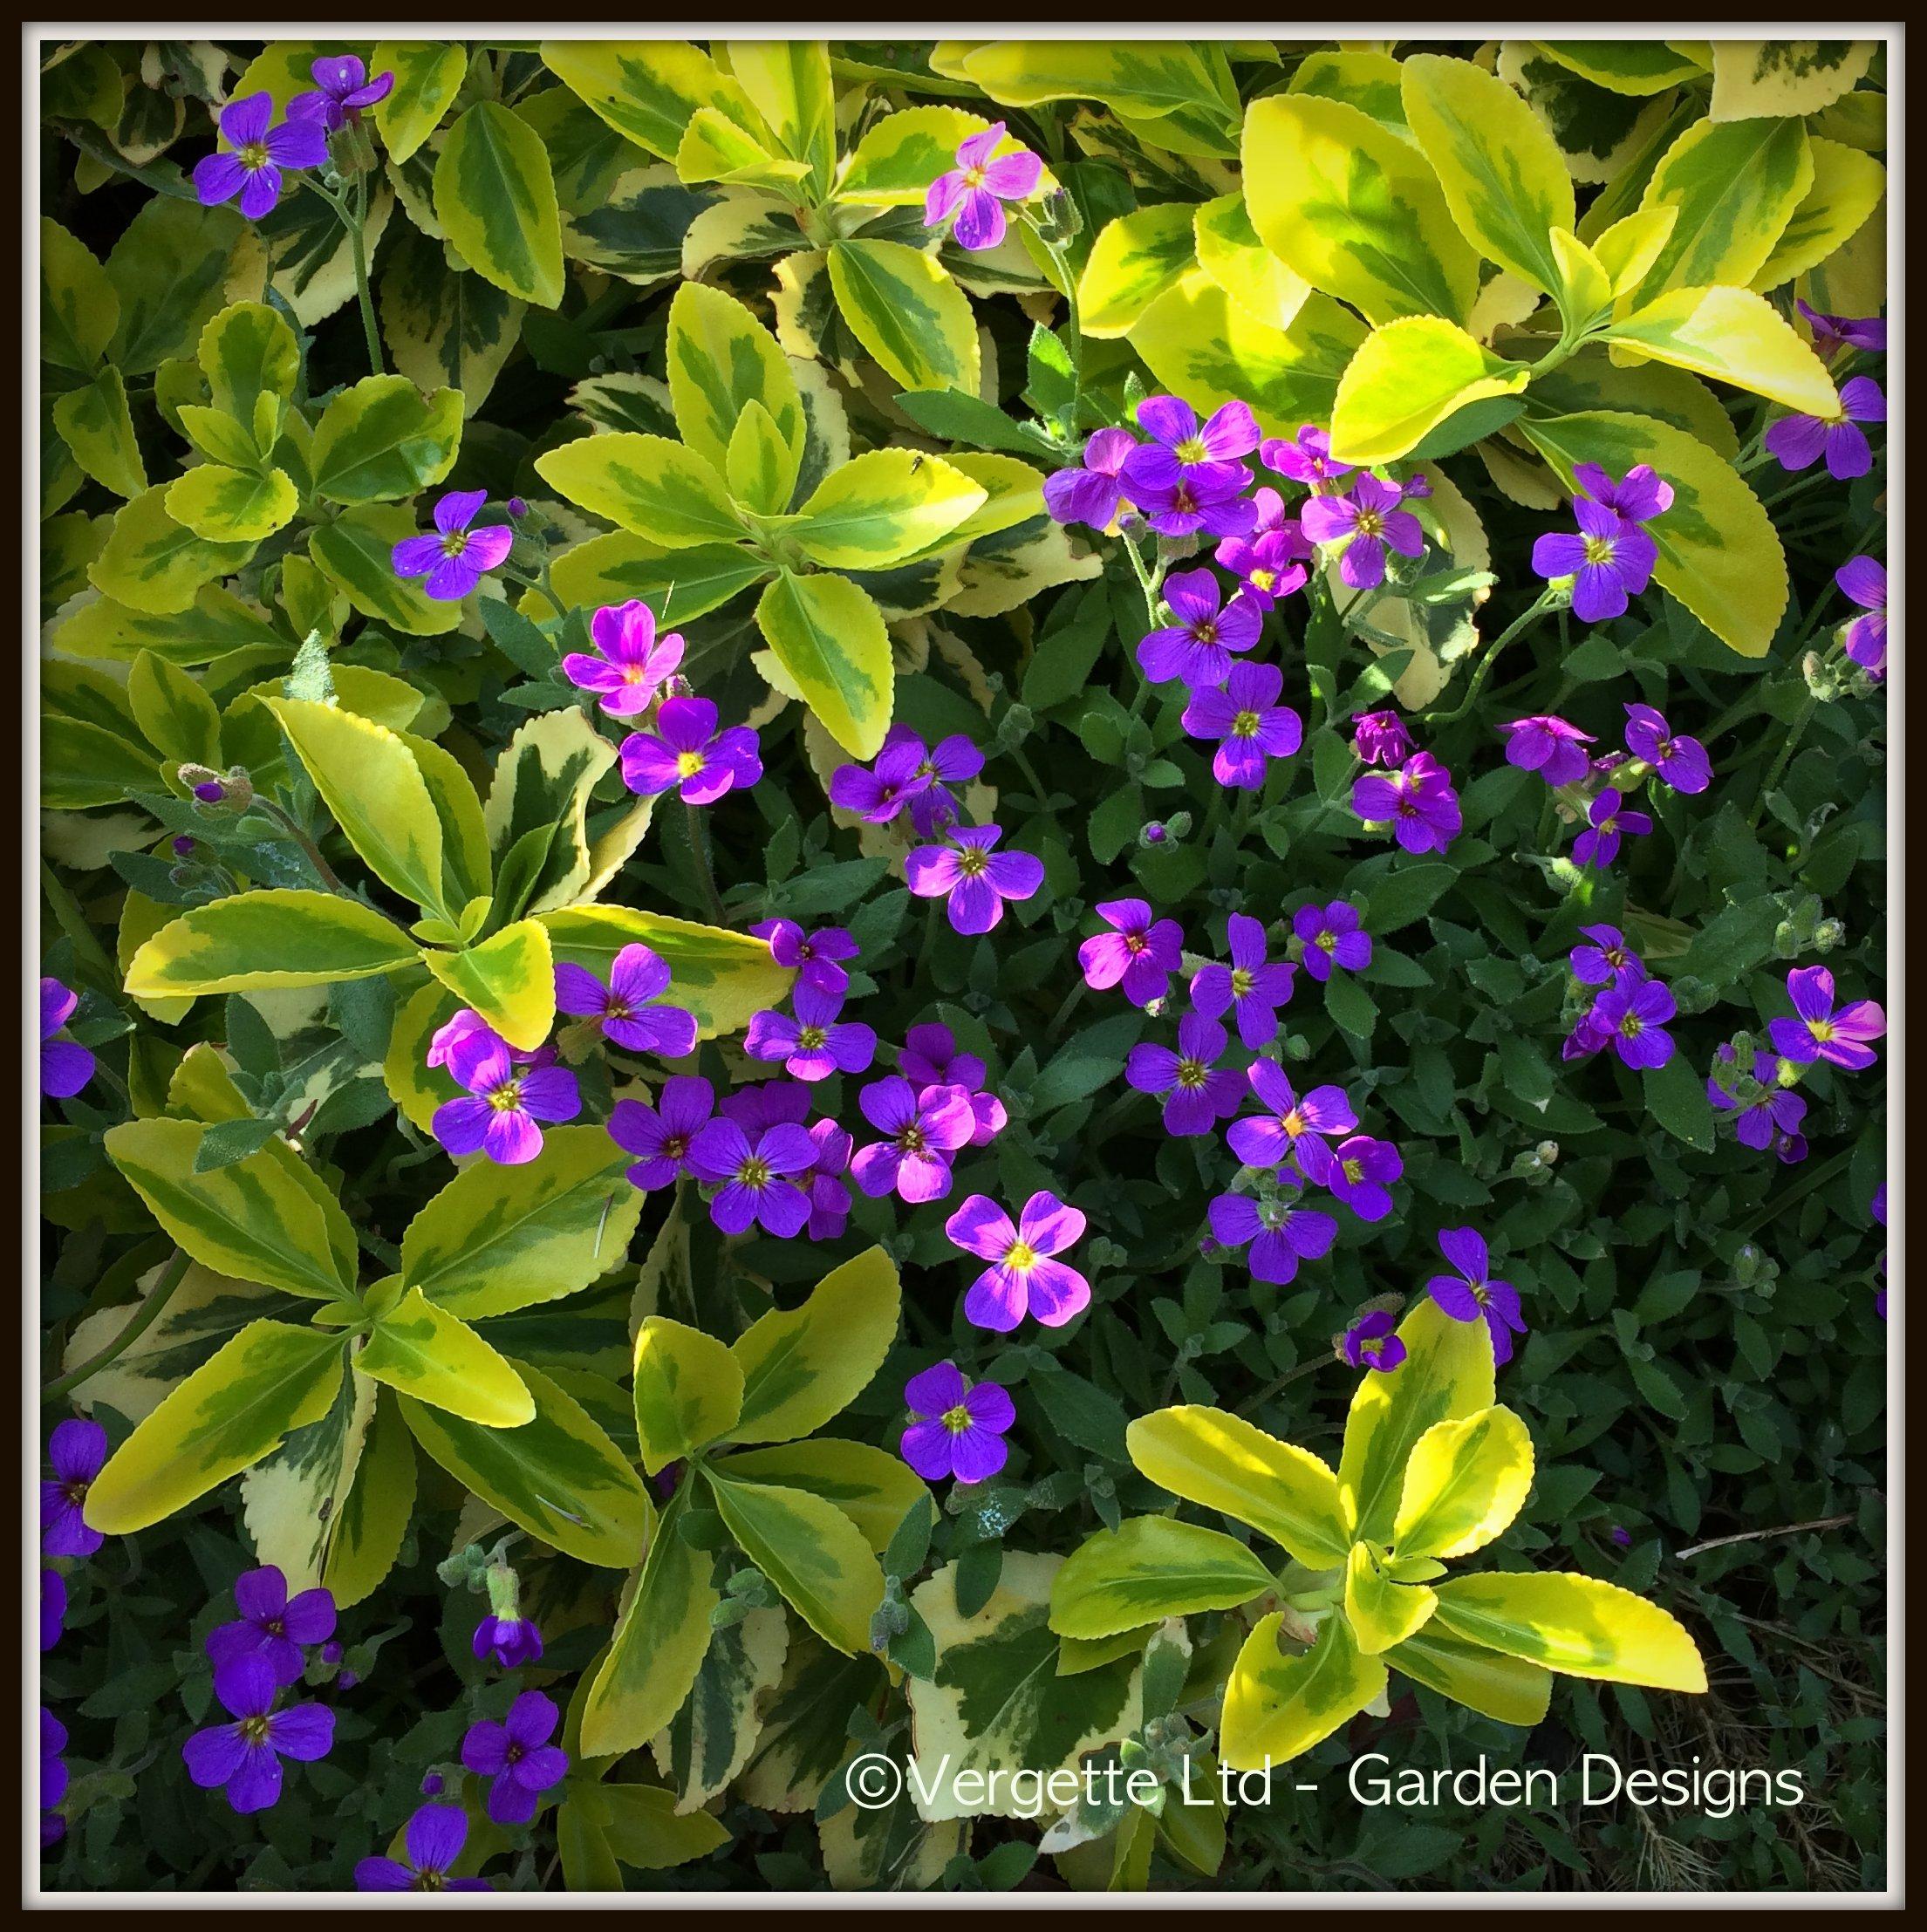 Euonymus fortunei 'Emerald 'n' Gold' with Aubretia 'Purple ...